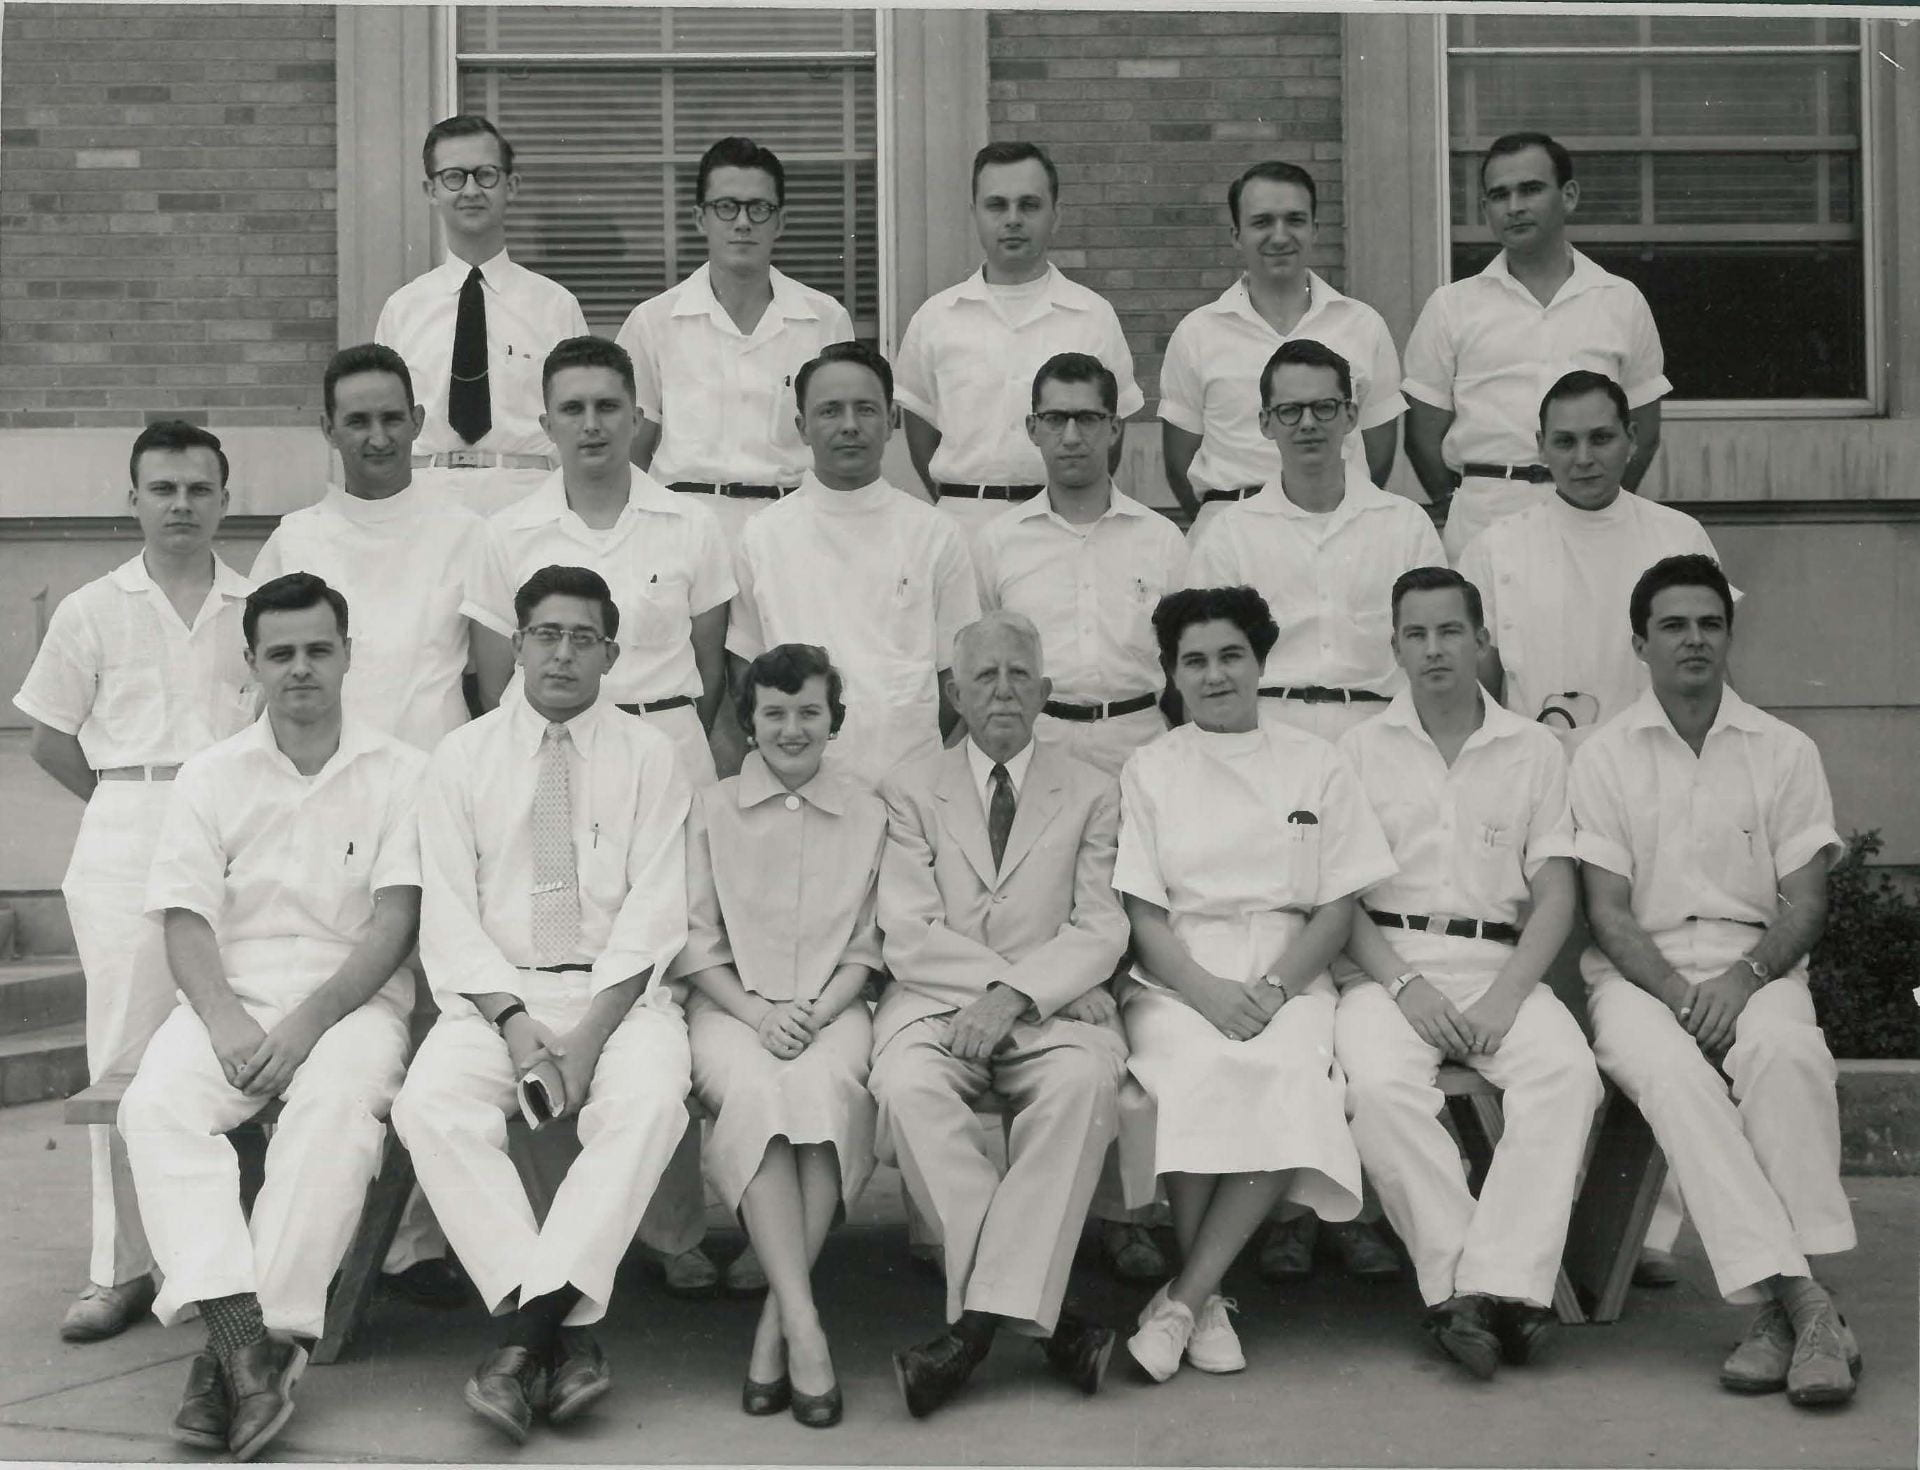 1953 Housestaff Photo (1)